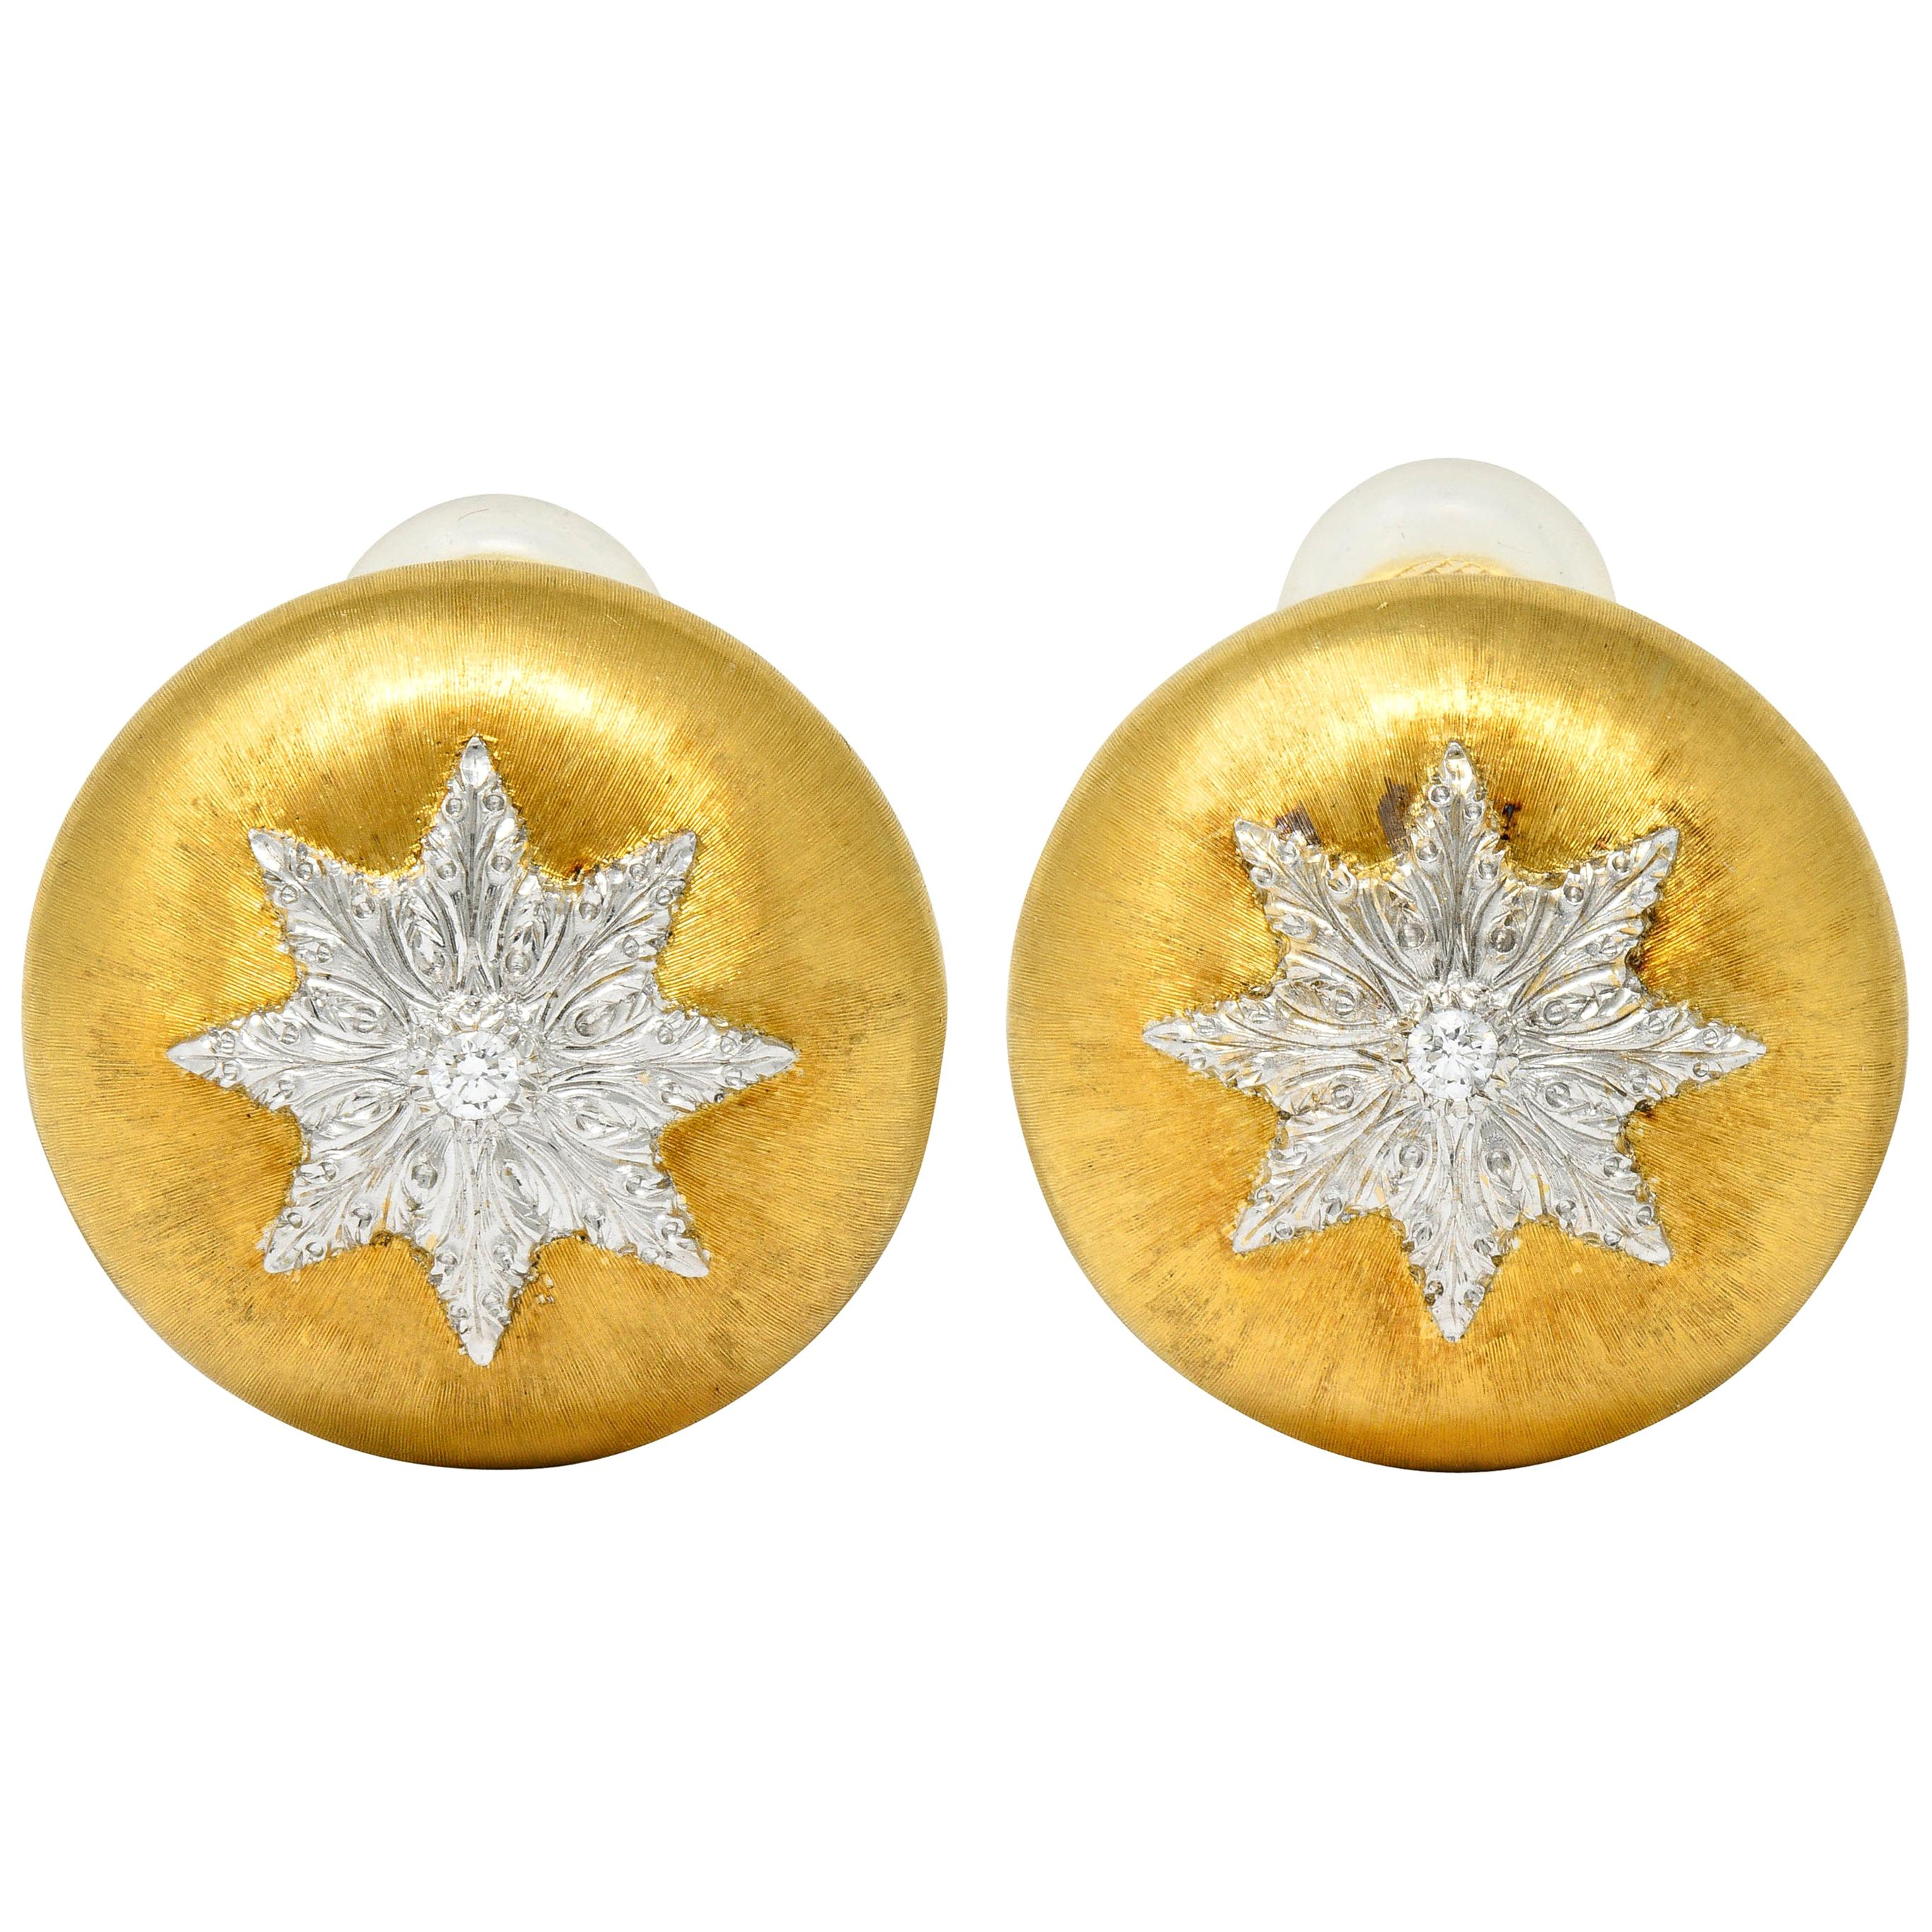 Buccellati Italian Diamond 18 Karat Two-Toned Gold Snowflake Ear-Clip Earrings